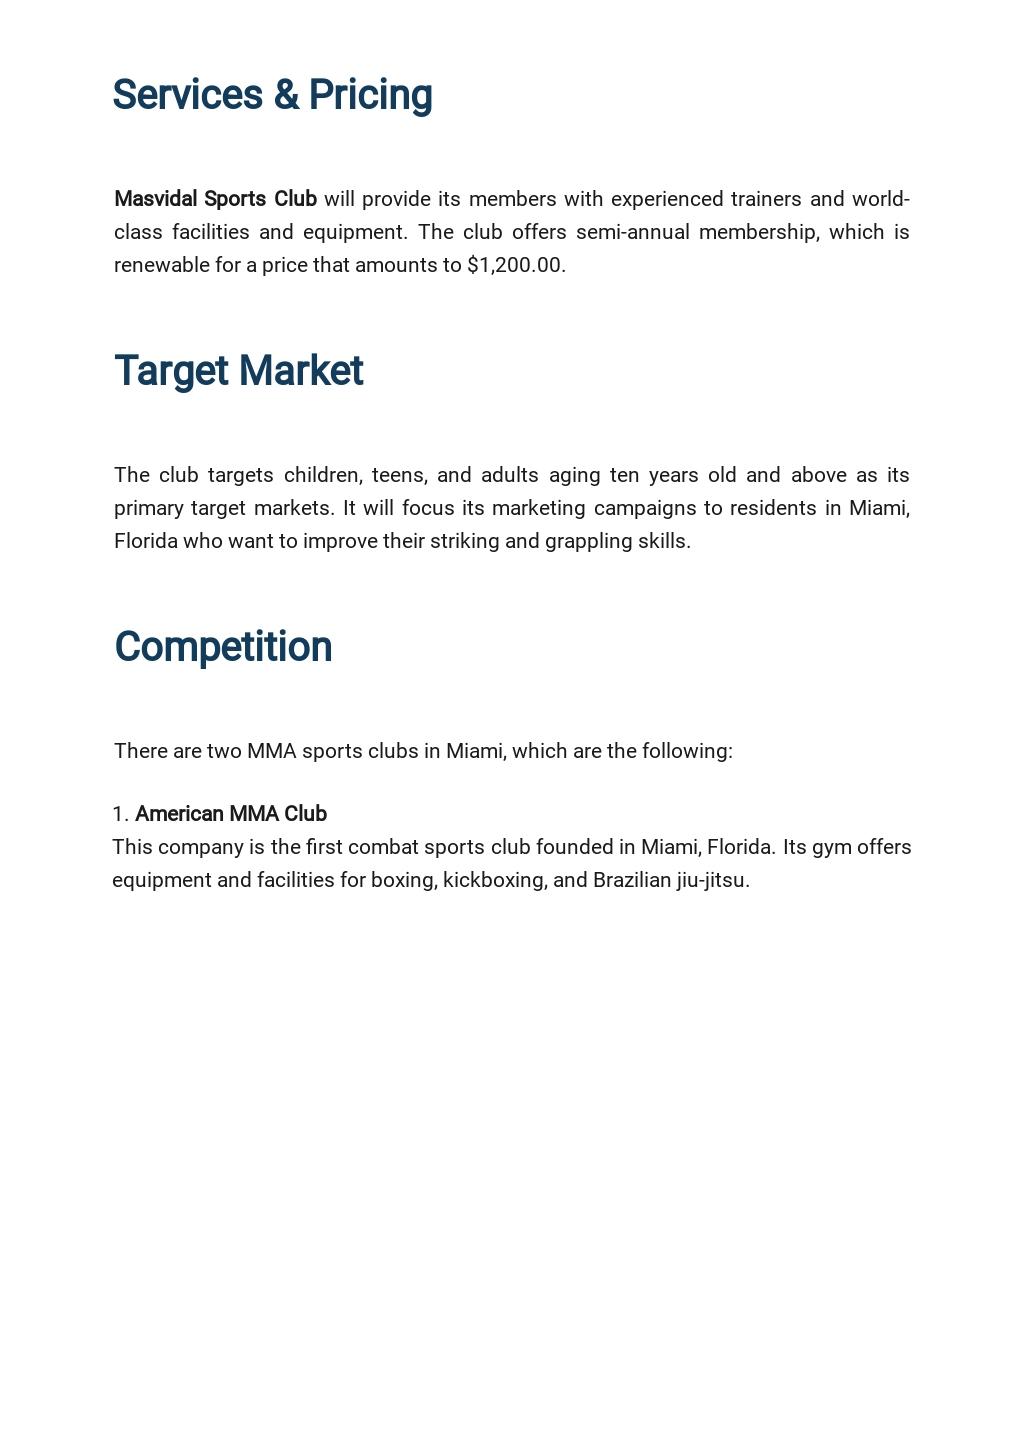 Sports Club Business Developement Plan Template 2.jpe